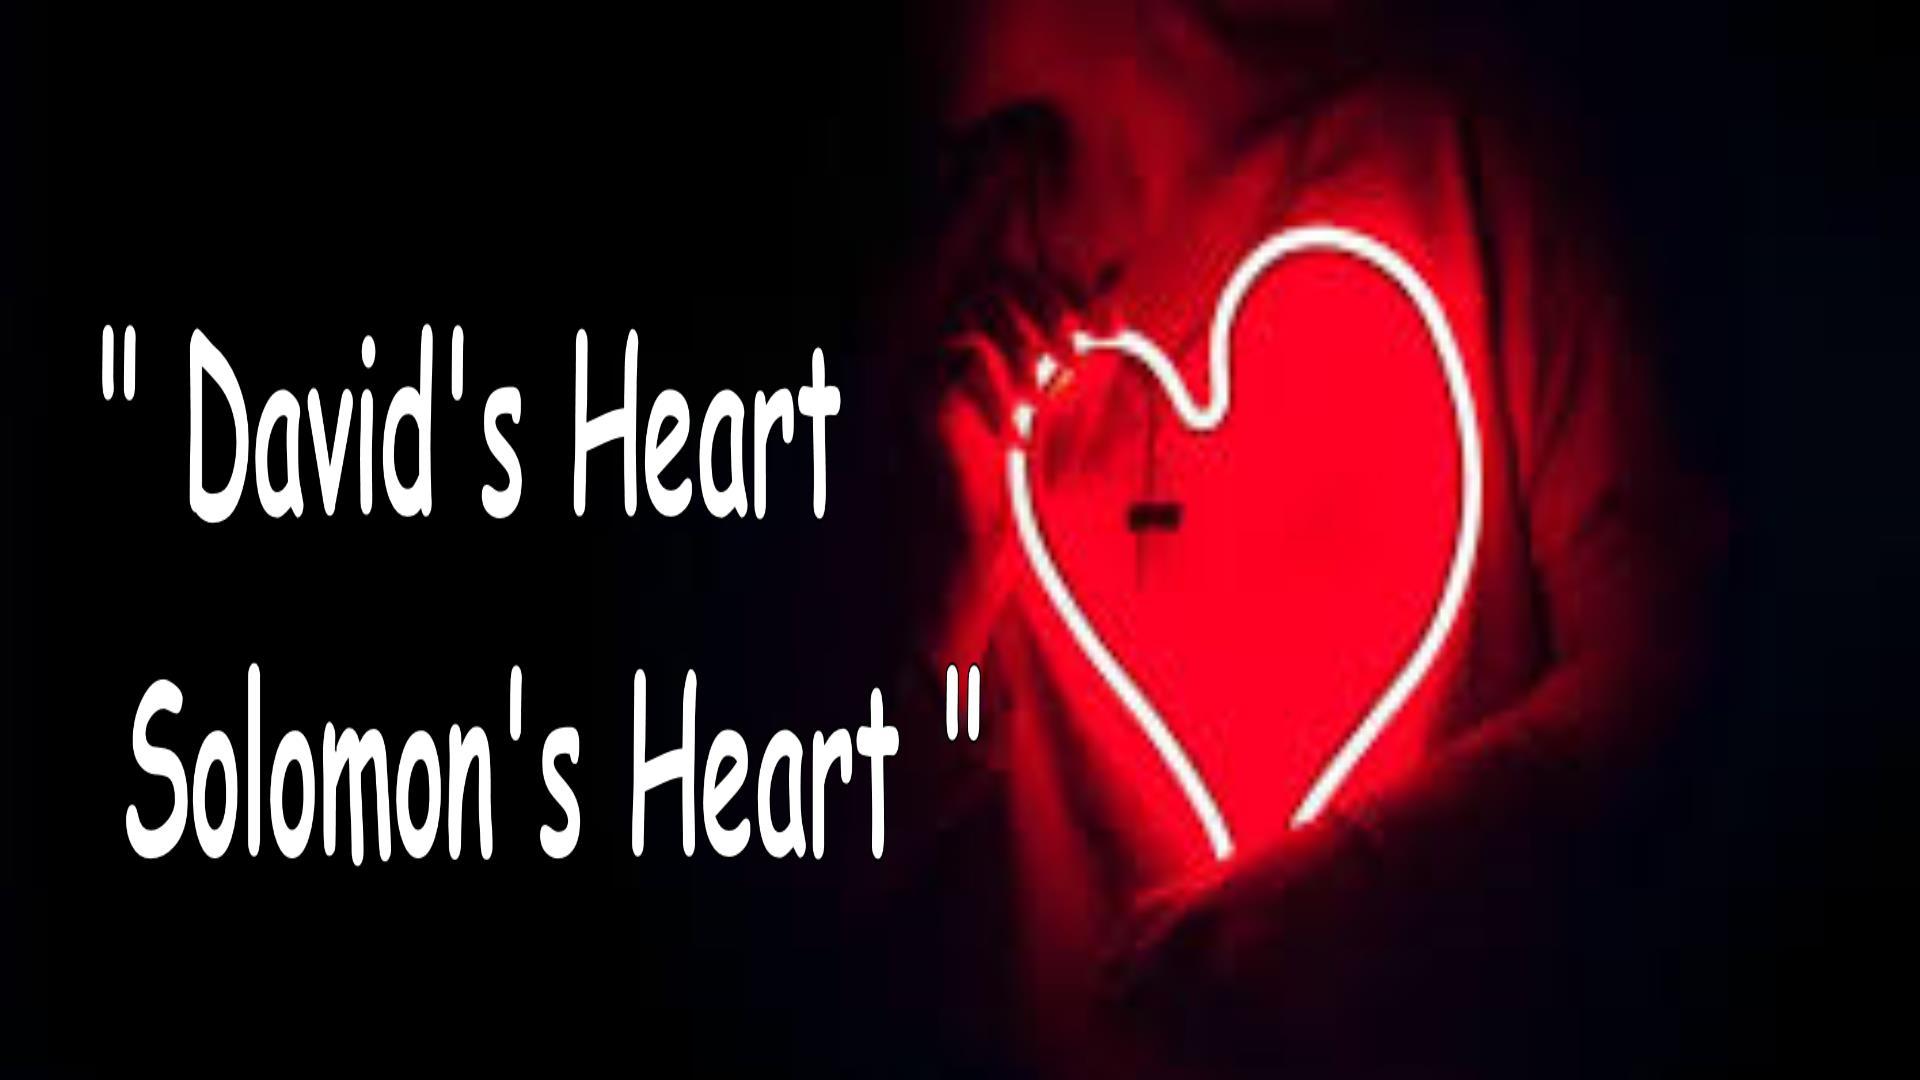 DAVID'S HEART - SOLOMON'S HEART